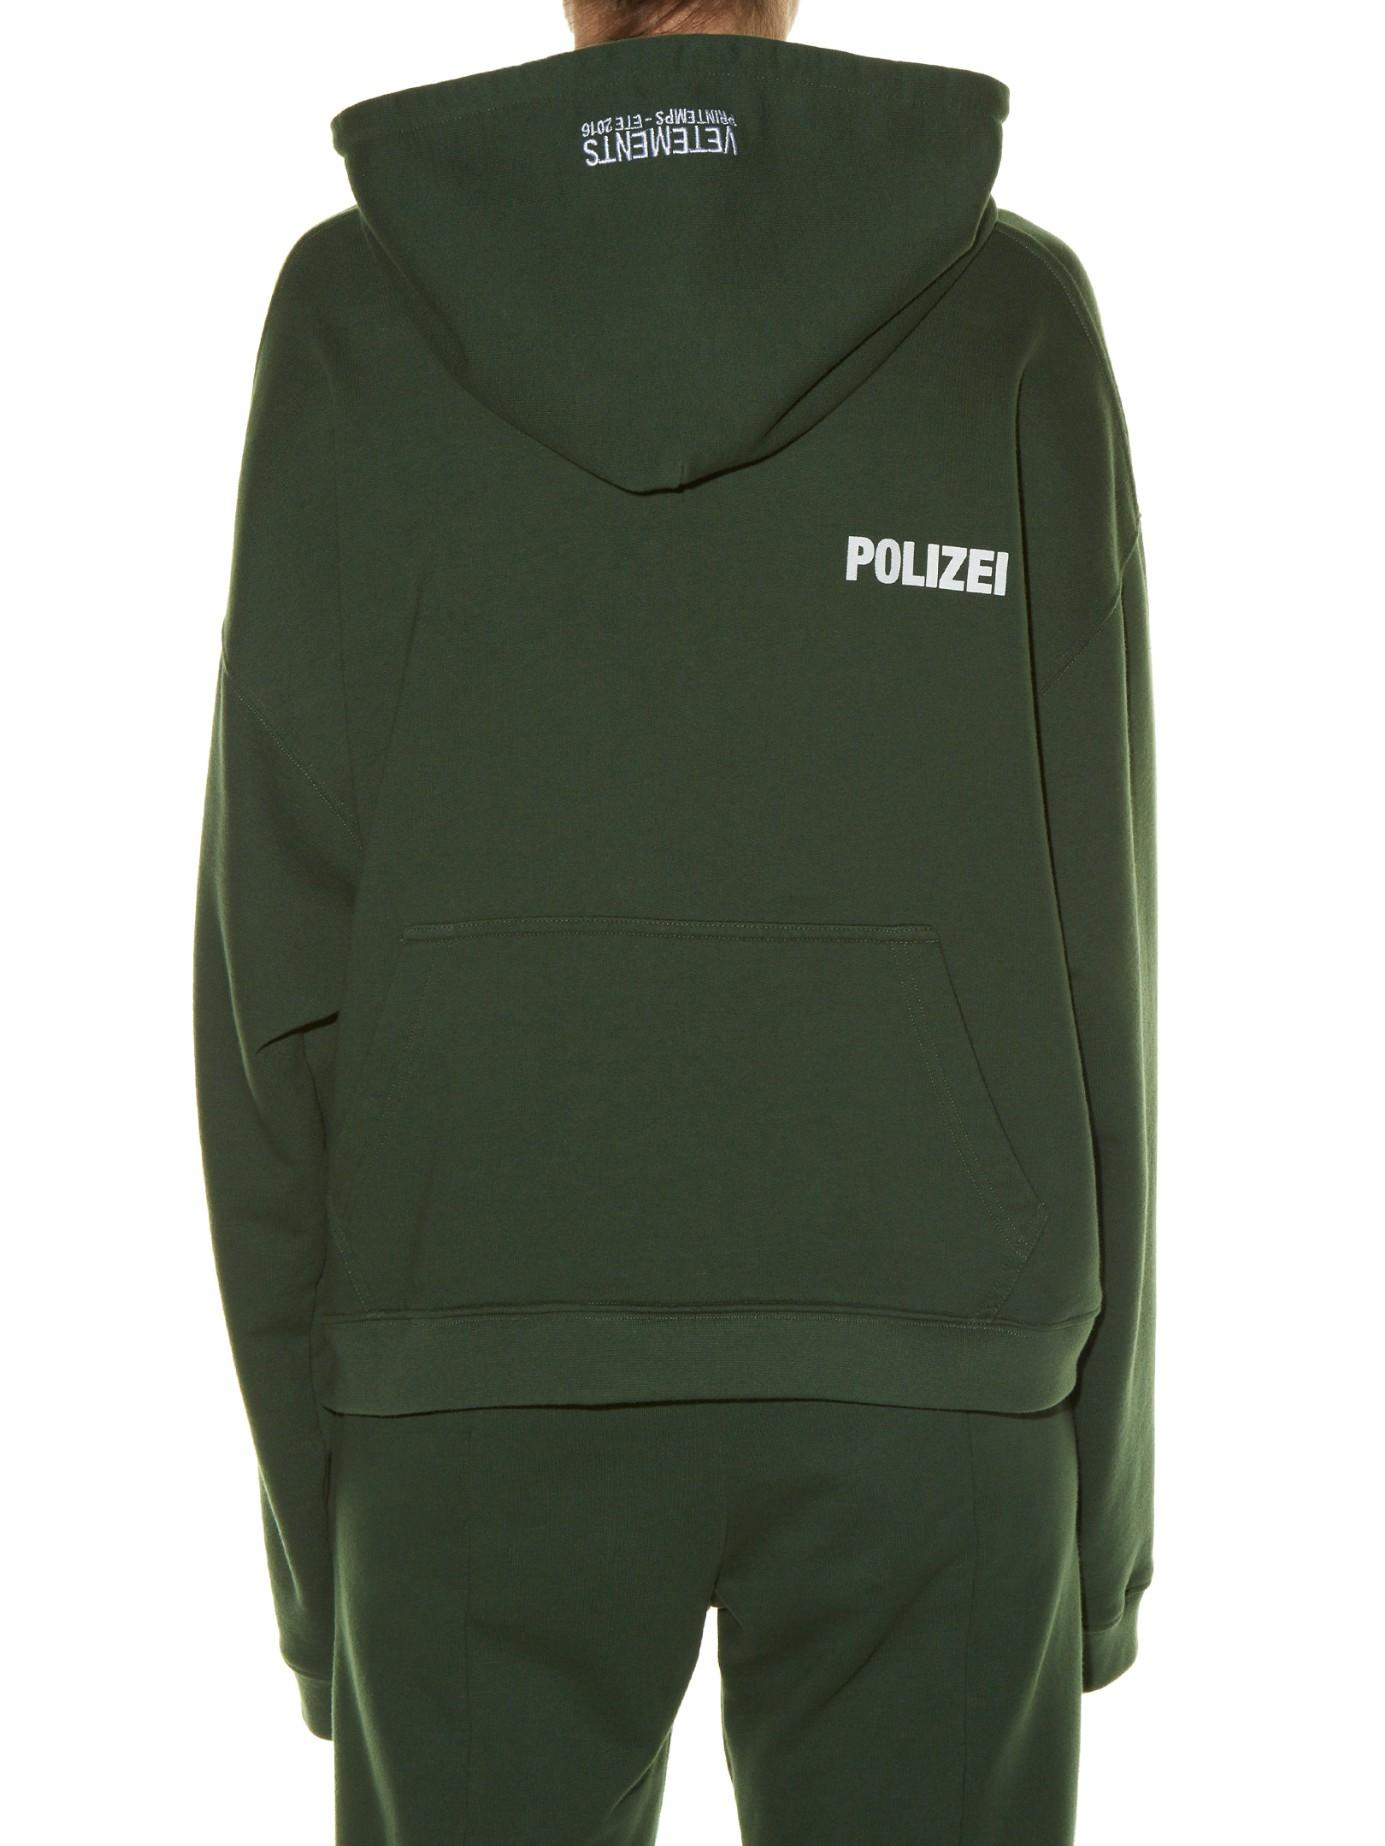 Lyst Vetements Hooded Polizei Print Sweatshirt In Green